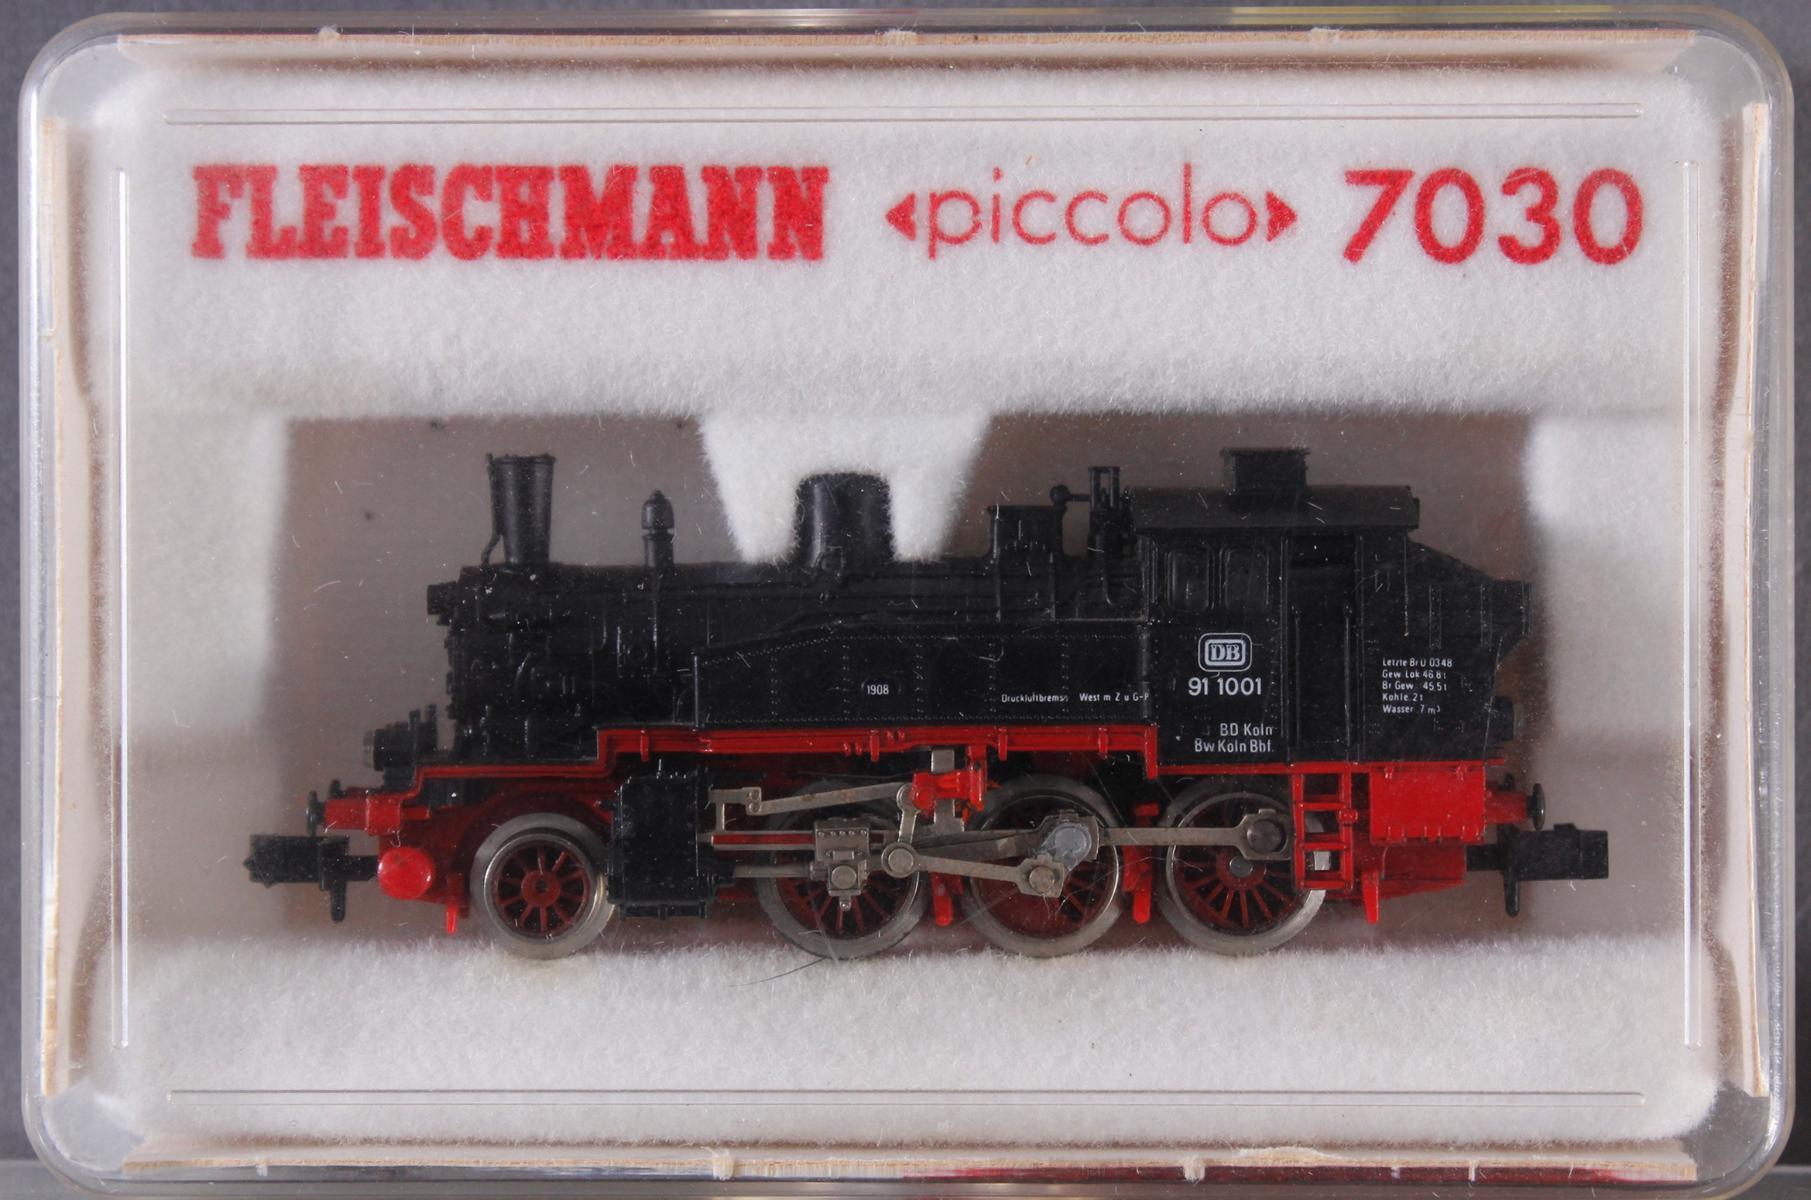 Fleischmann Dampf-Lok Piccolo 7030 mit 5 Waggons-2